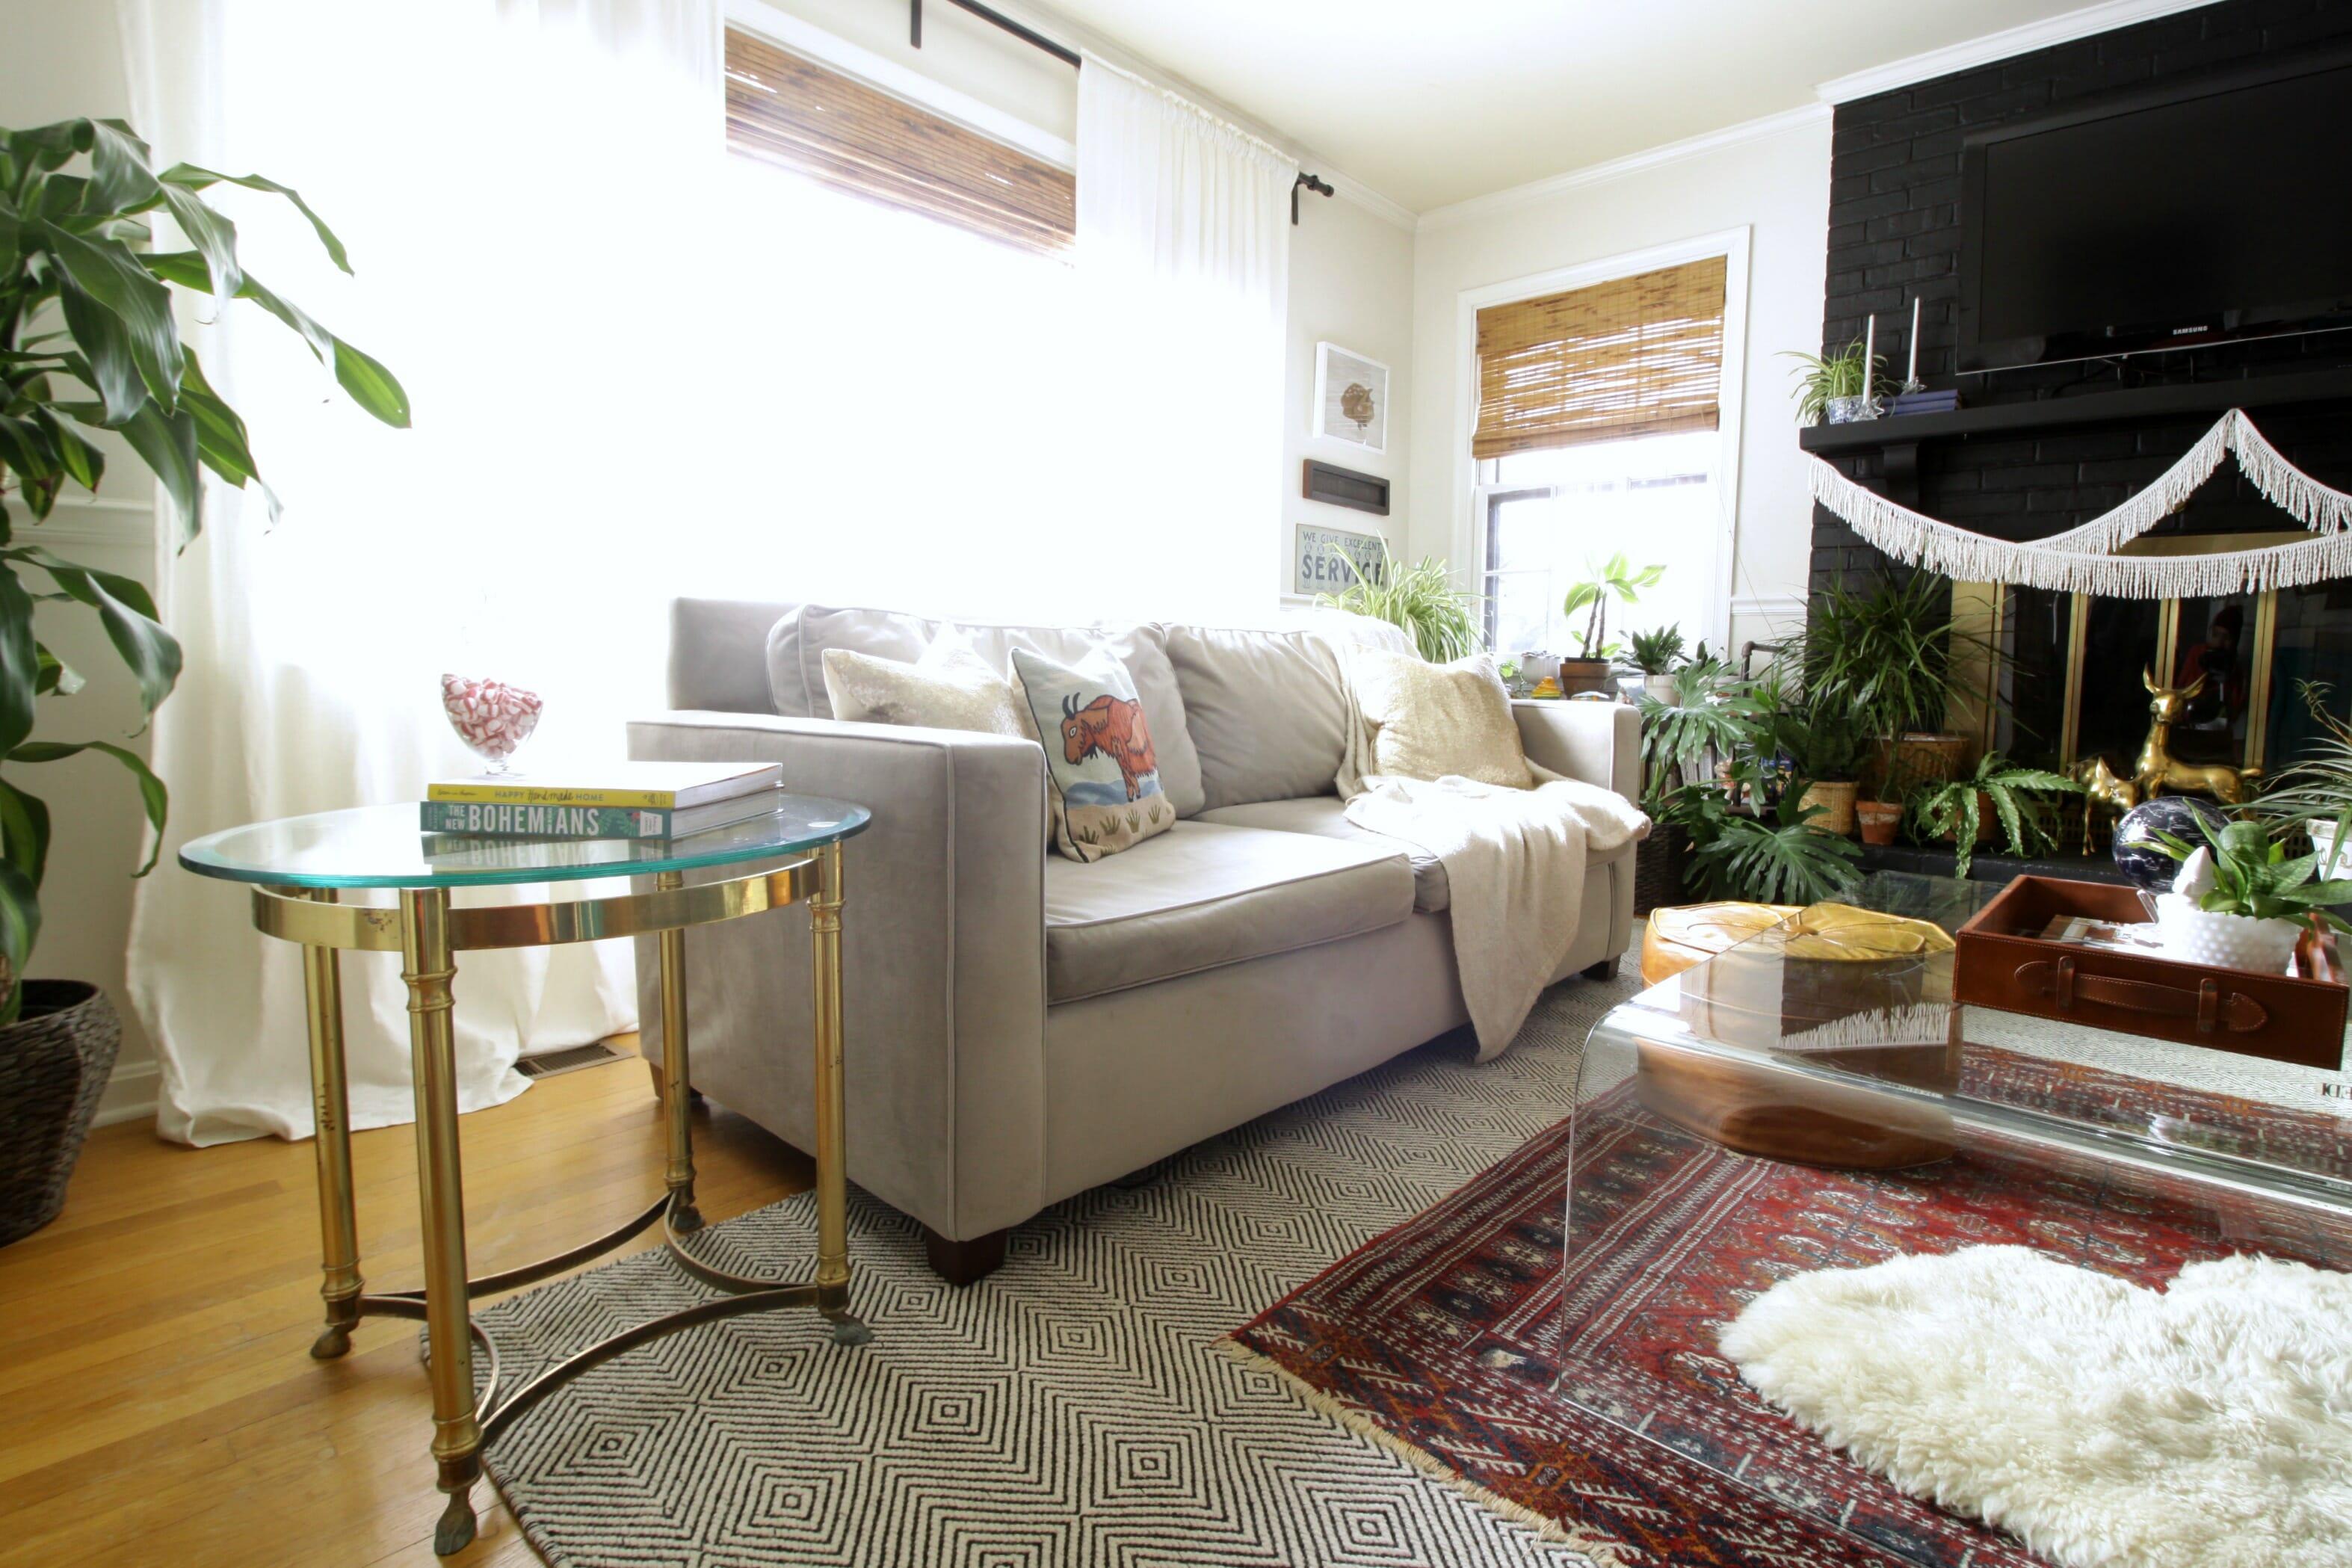 West Elm Henry Sofa In Living Room